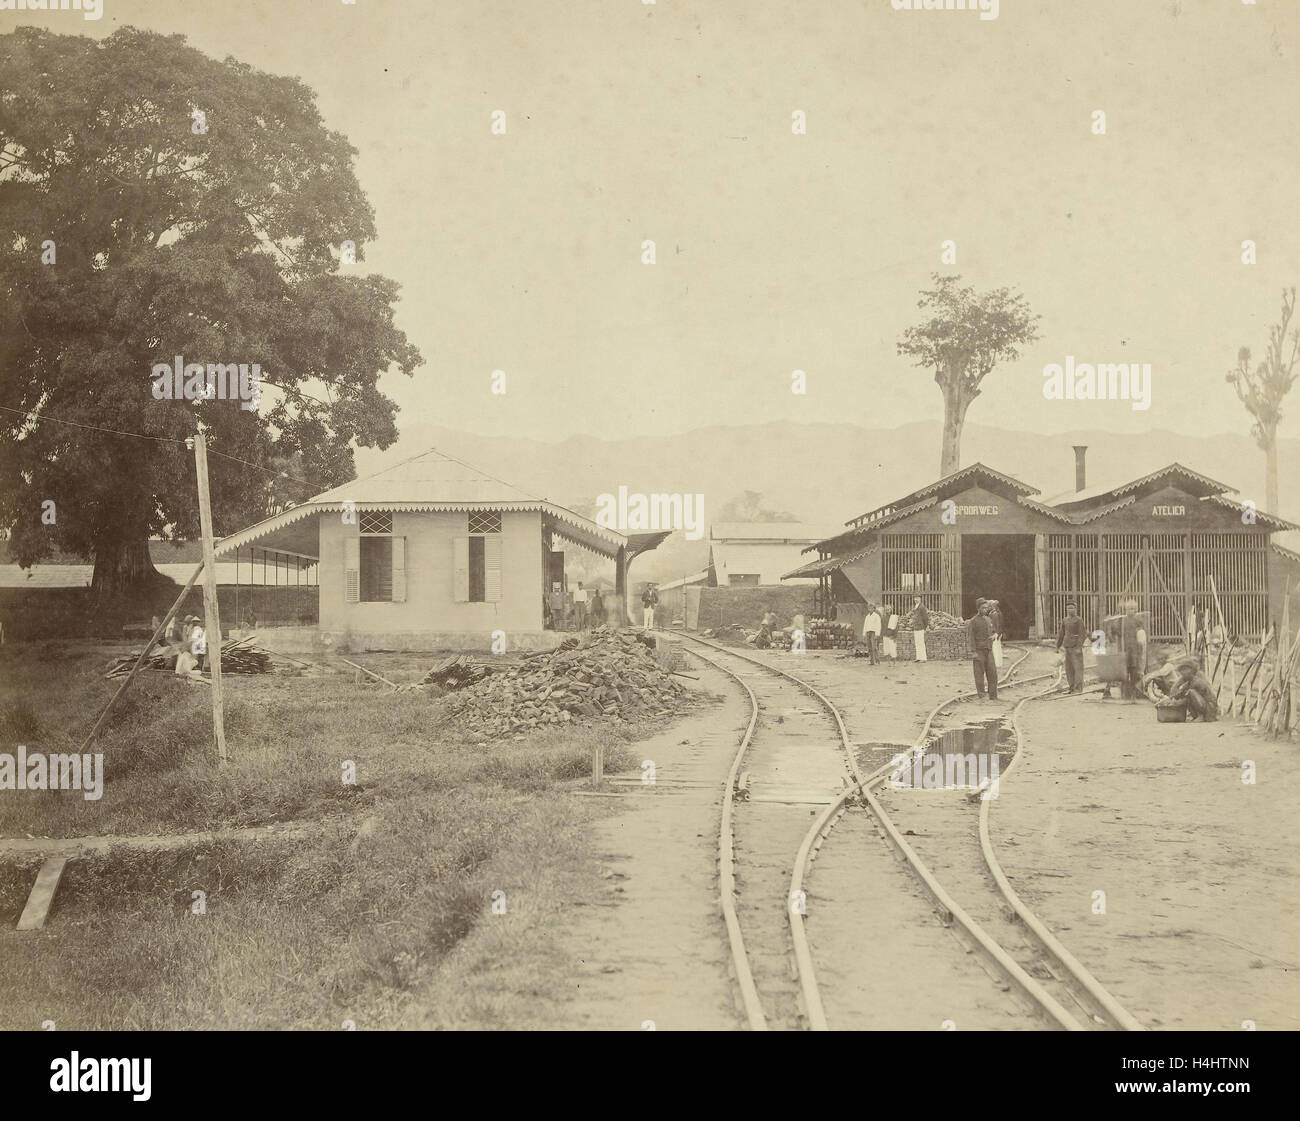 Spoorwegstation Kraton te Kota Radja, het huidige Banda Aceh. Anonymous, 1870 - 1900 Stock Photo